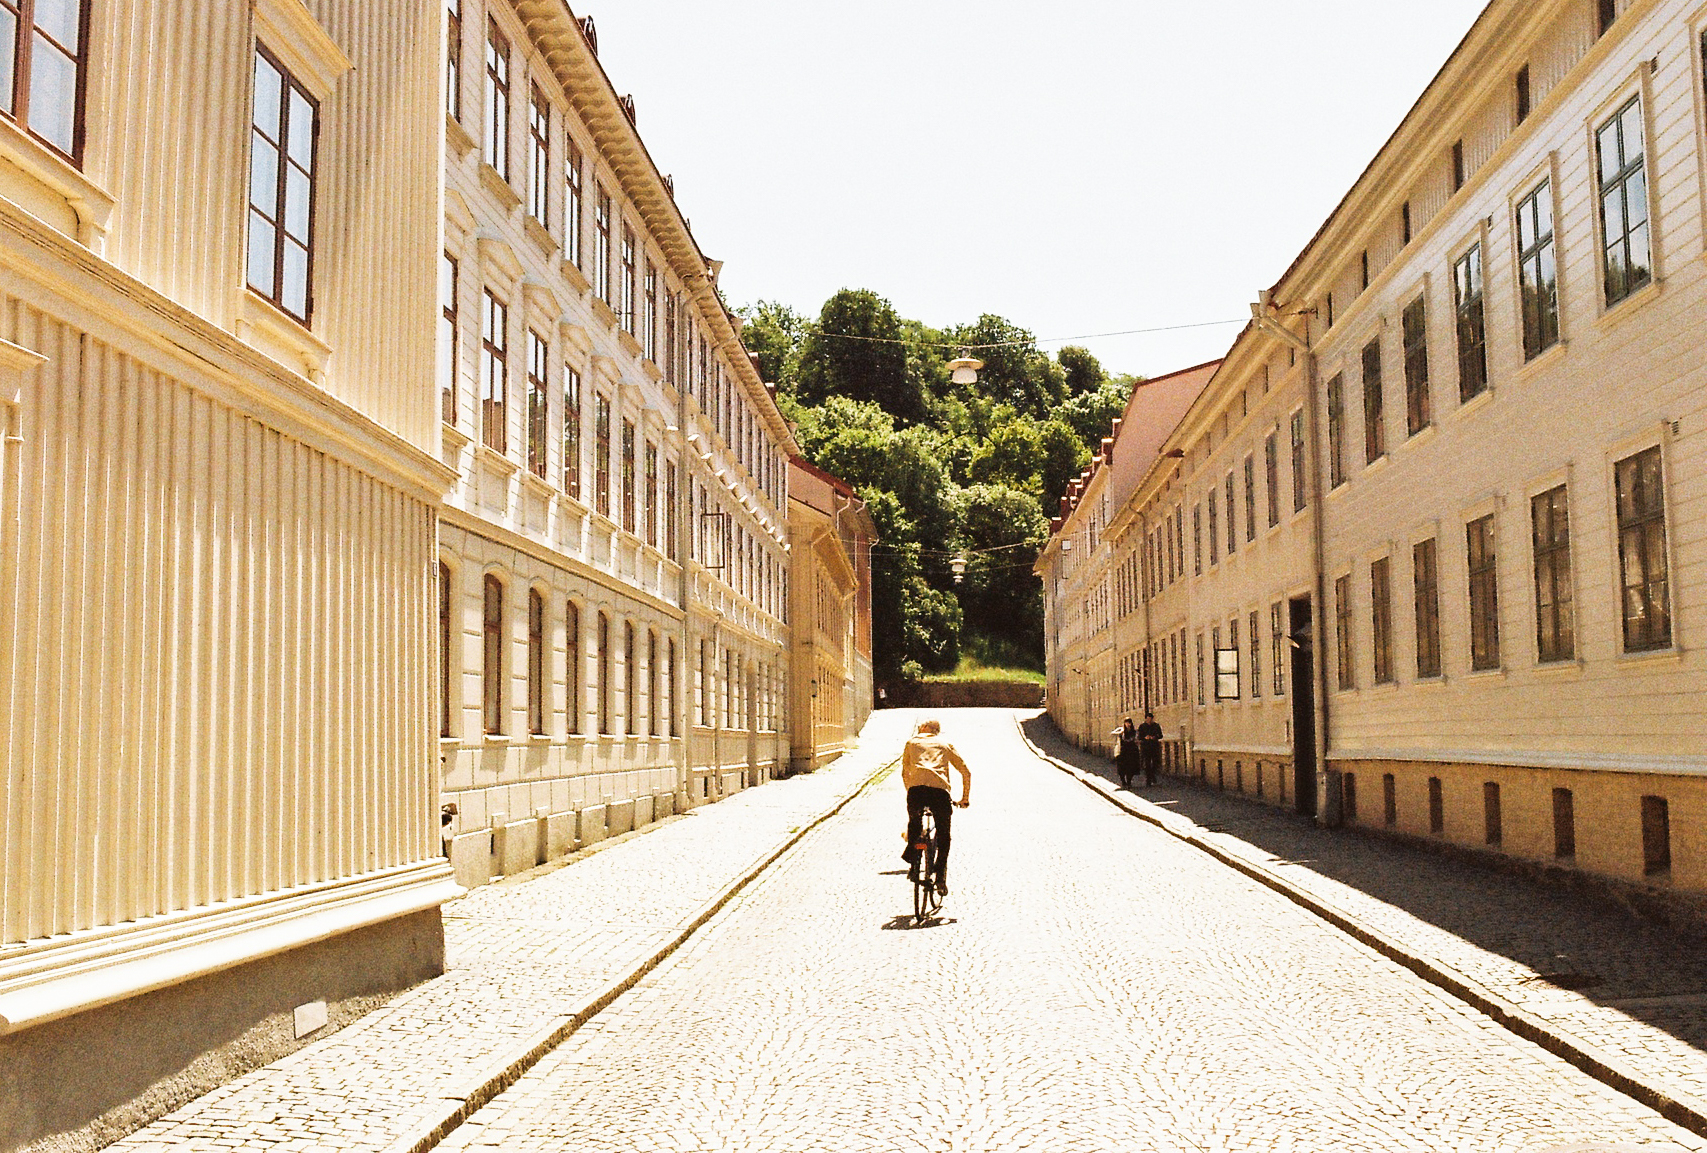 swedish-midsommar-2018-35mm-93.jpg